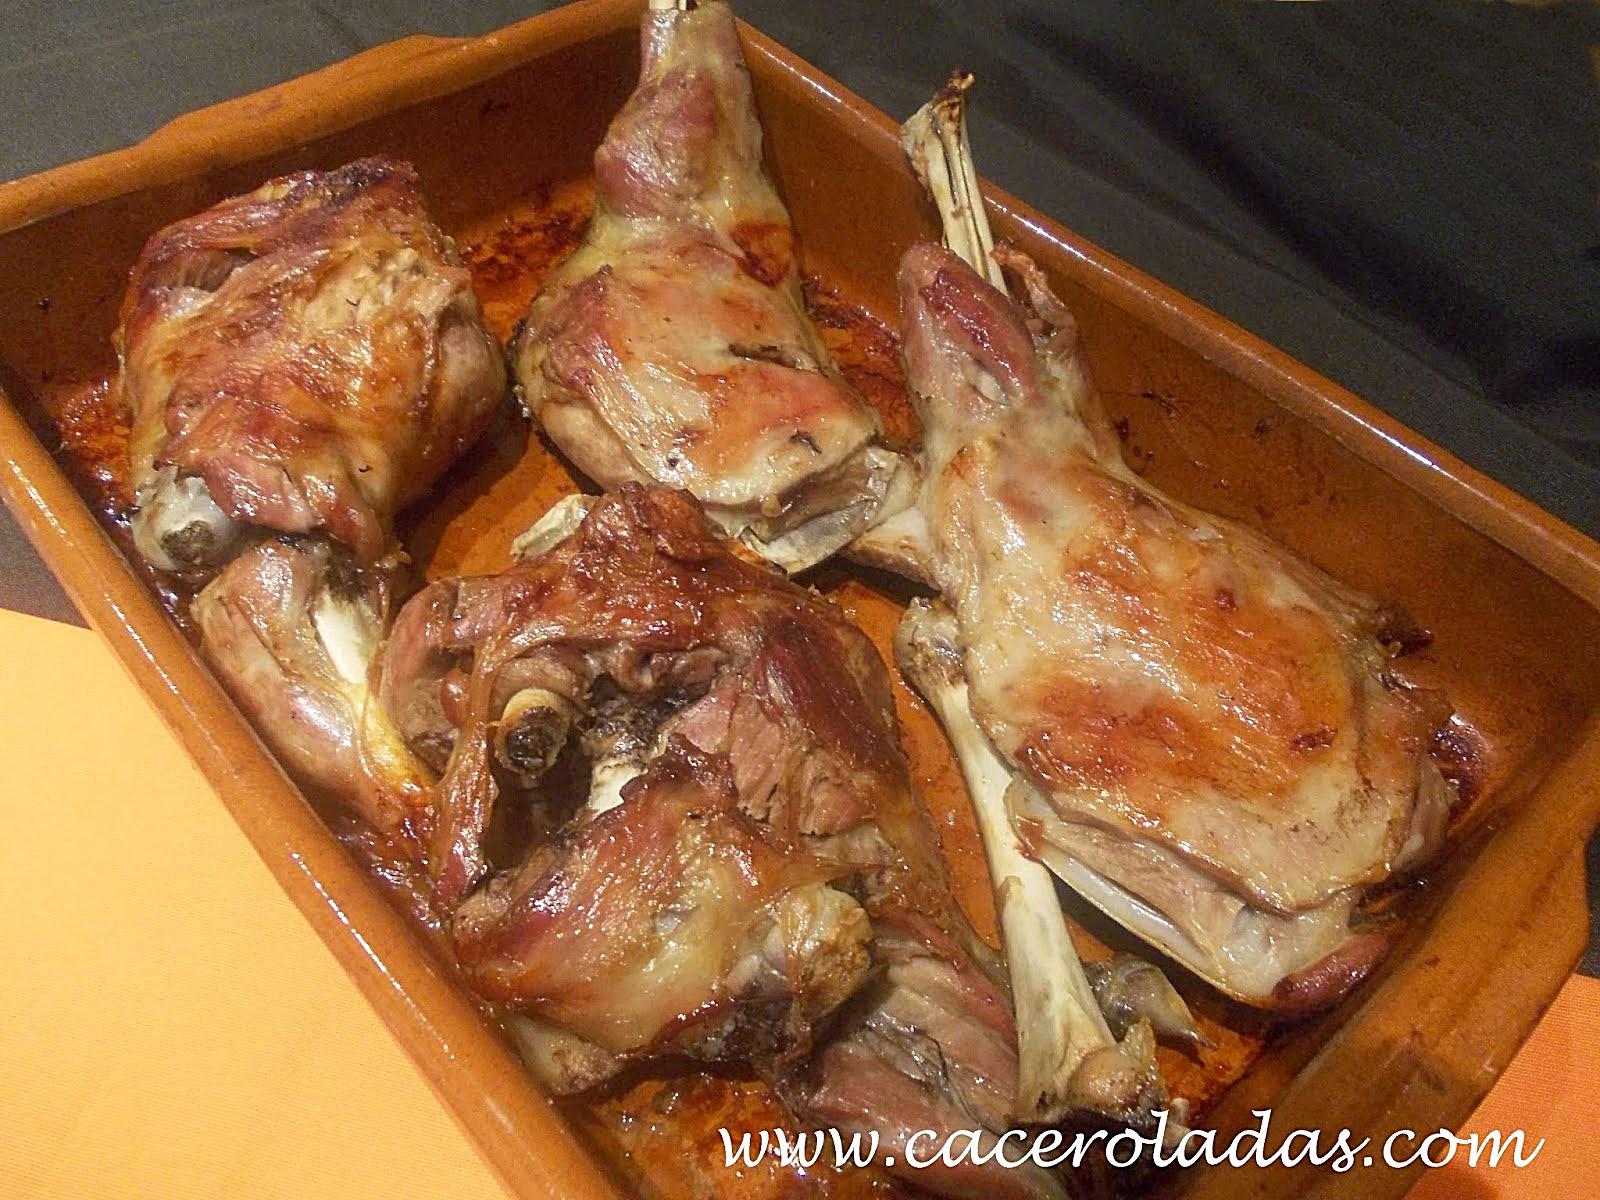 Cordero lechal al horno caceroladas for Cocinar paletilla de cordero